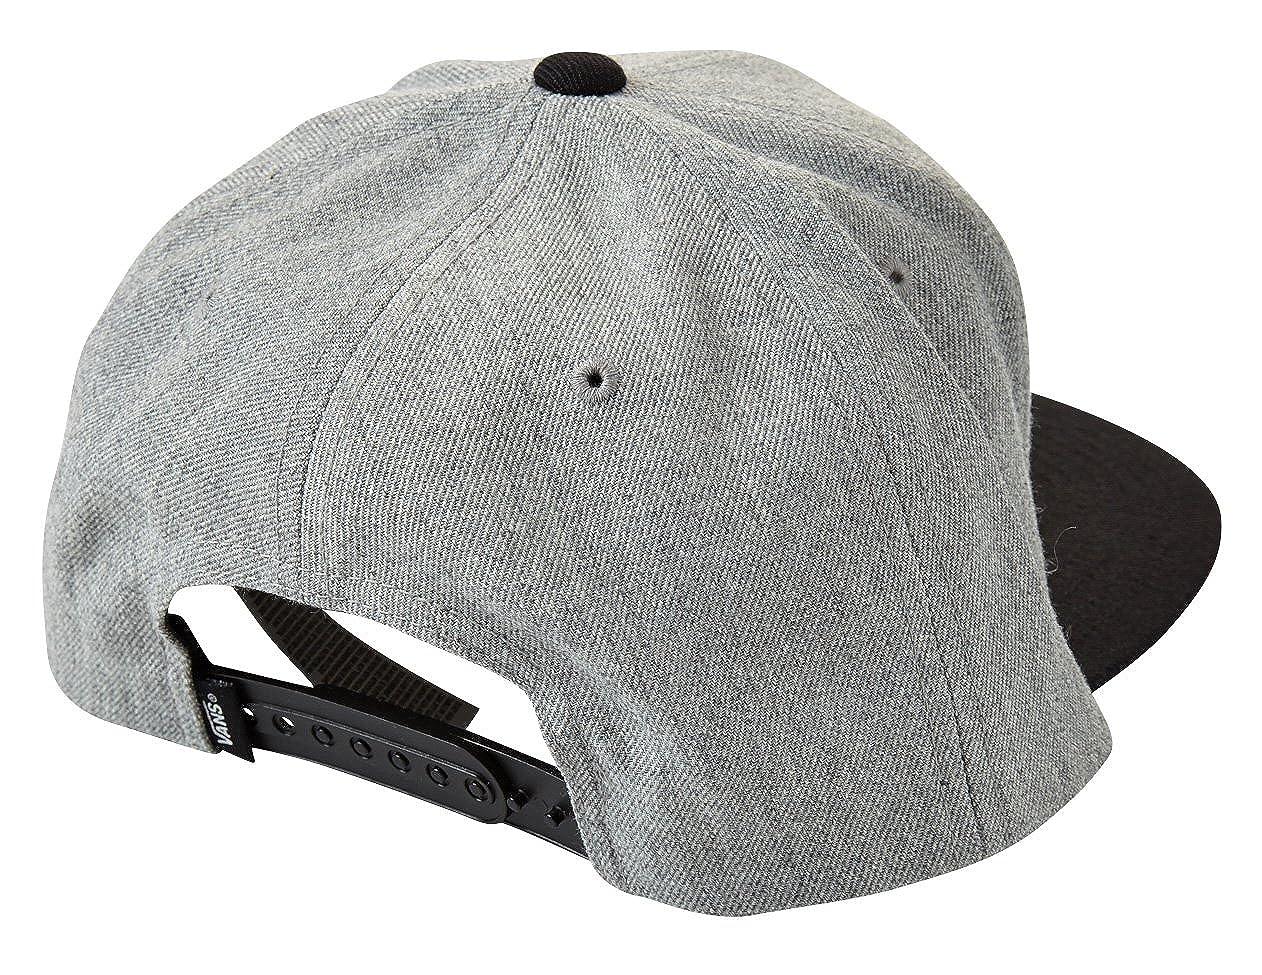 09557f6131948 Amazon | VANS バンズ キャップ Drop V II Snapback Cap メンズ【フリー HEGRY(ヘザーグレー×ブラック)】  [並行輸入品] | キャップ 通販